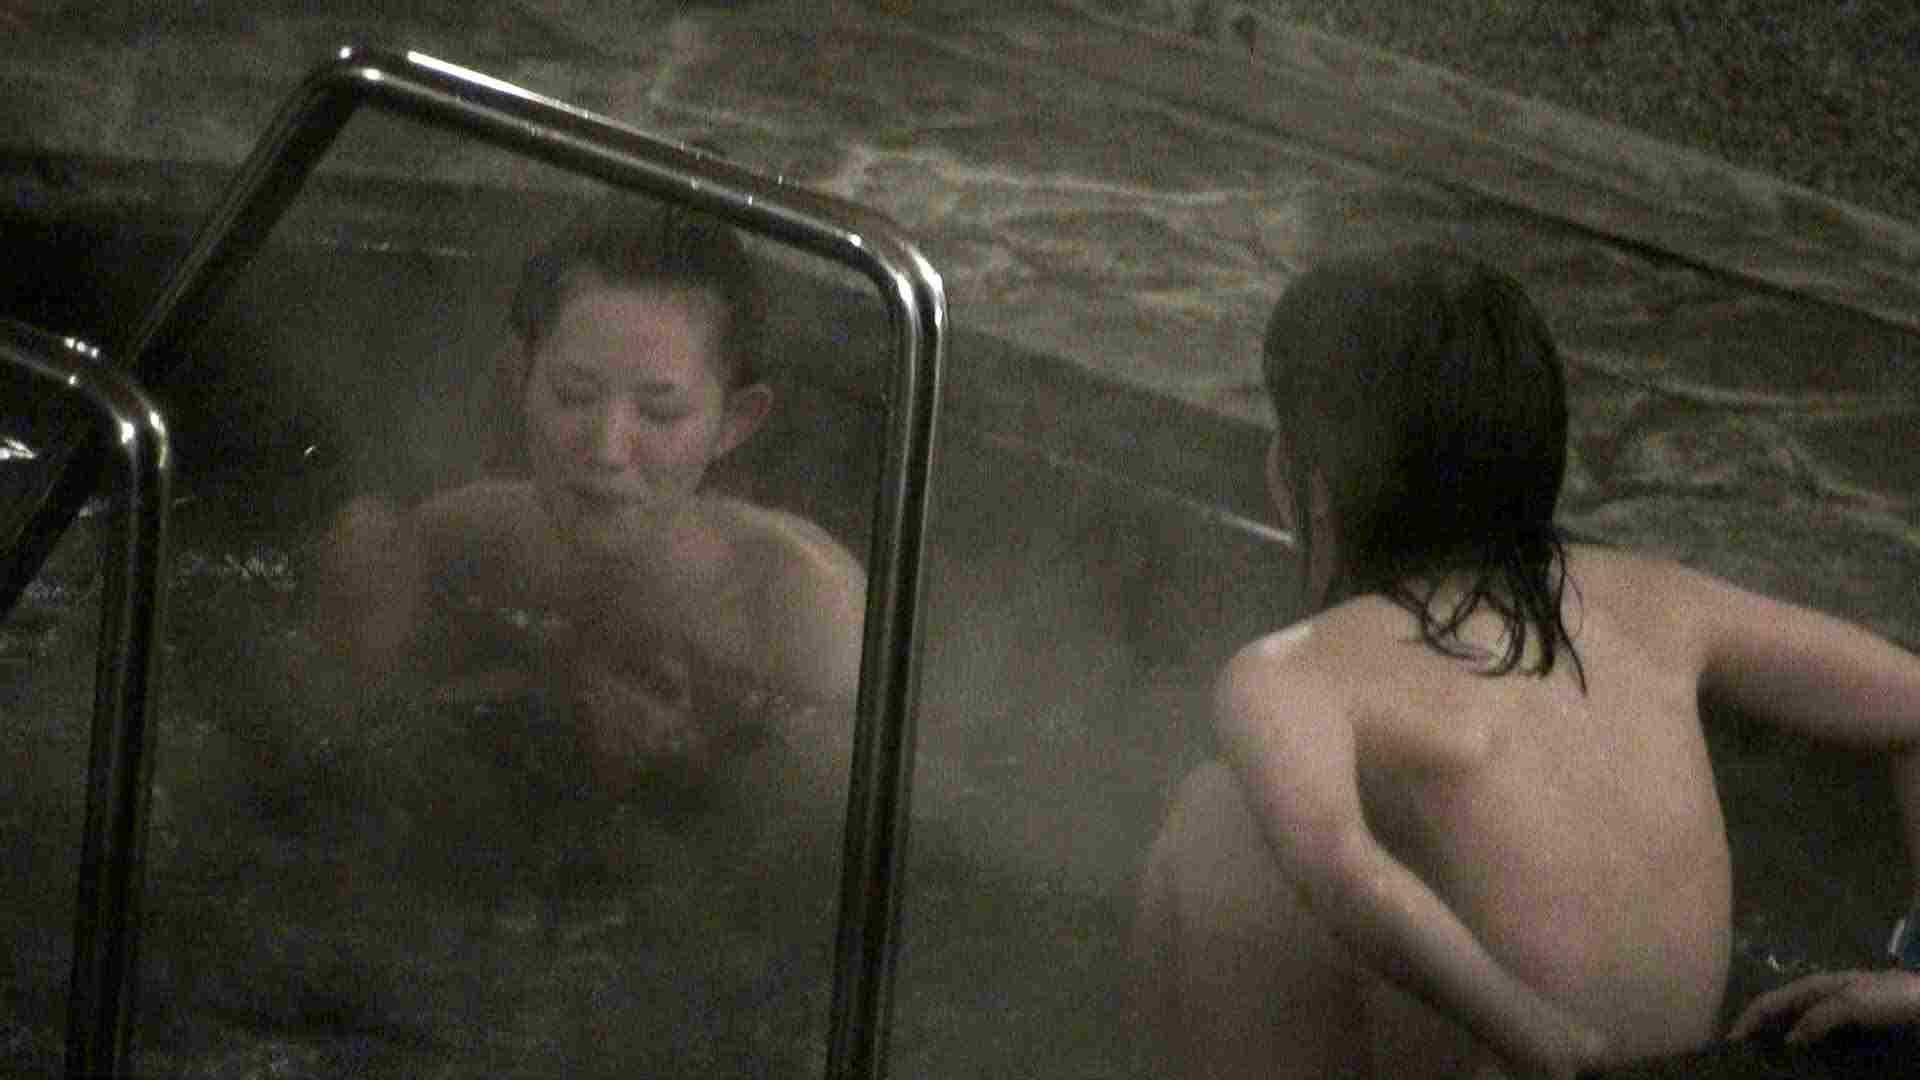 Aquaな露天風呂Vol.363 盗撮 | OLセックス  90画像 25